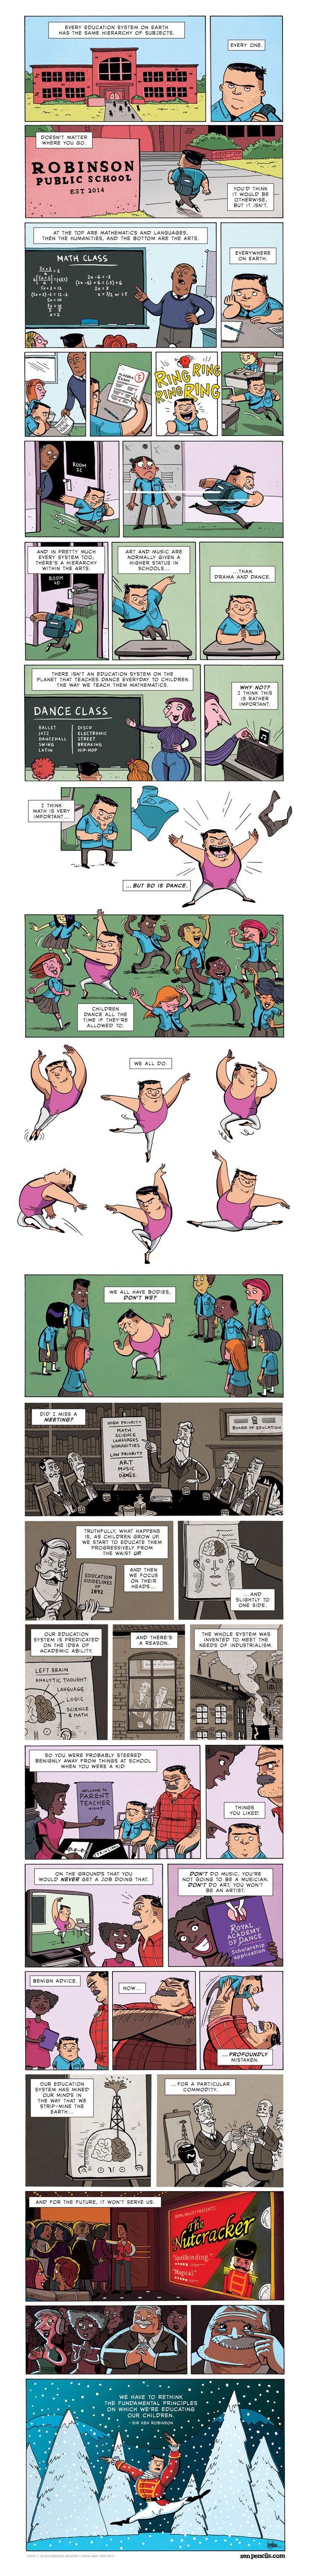 ZEN PENCILS » 162. SIR KEN ROBINSON: Full body education